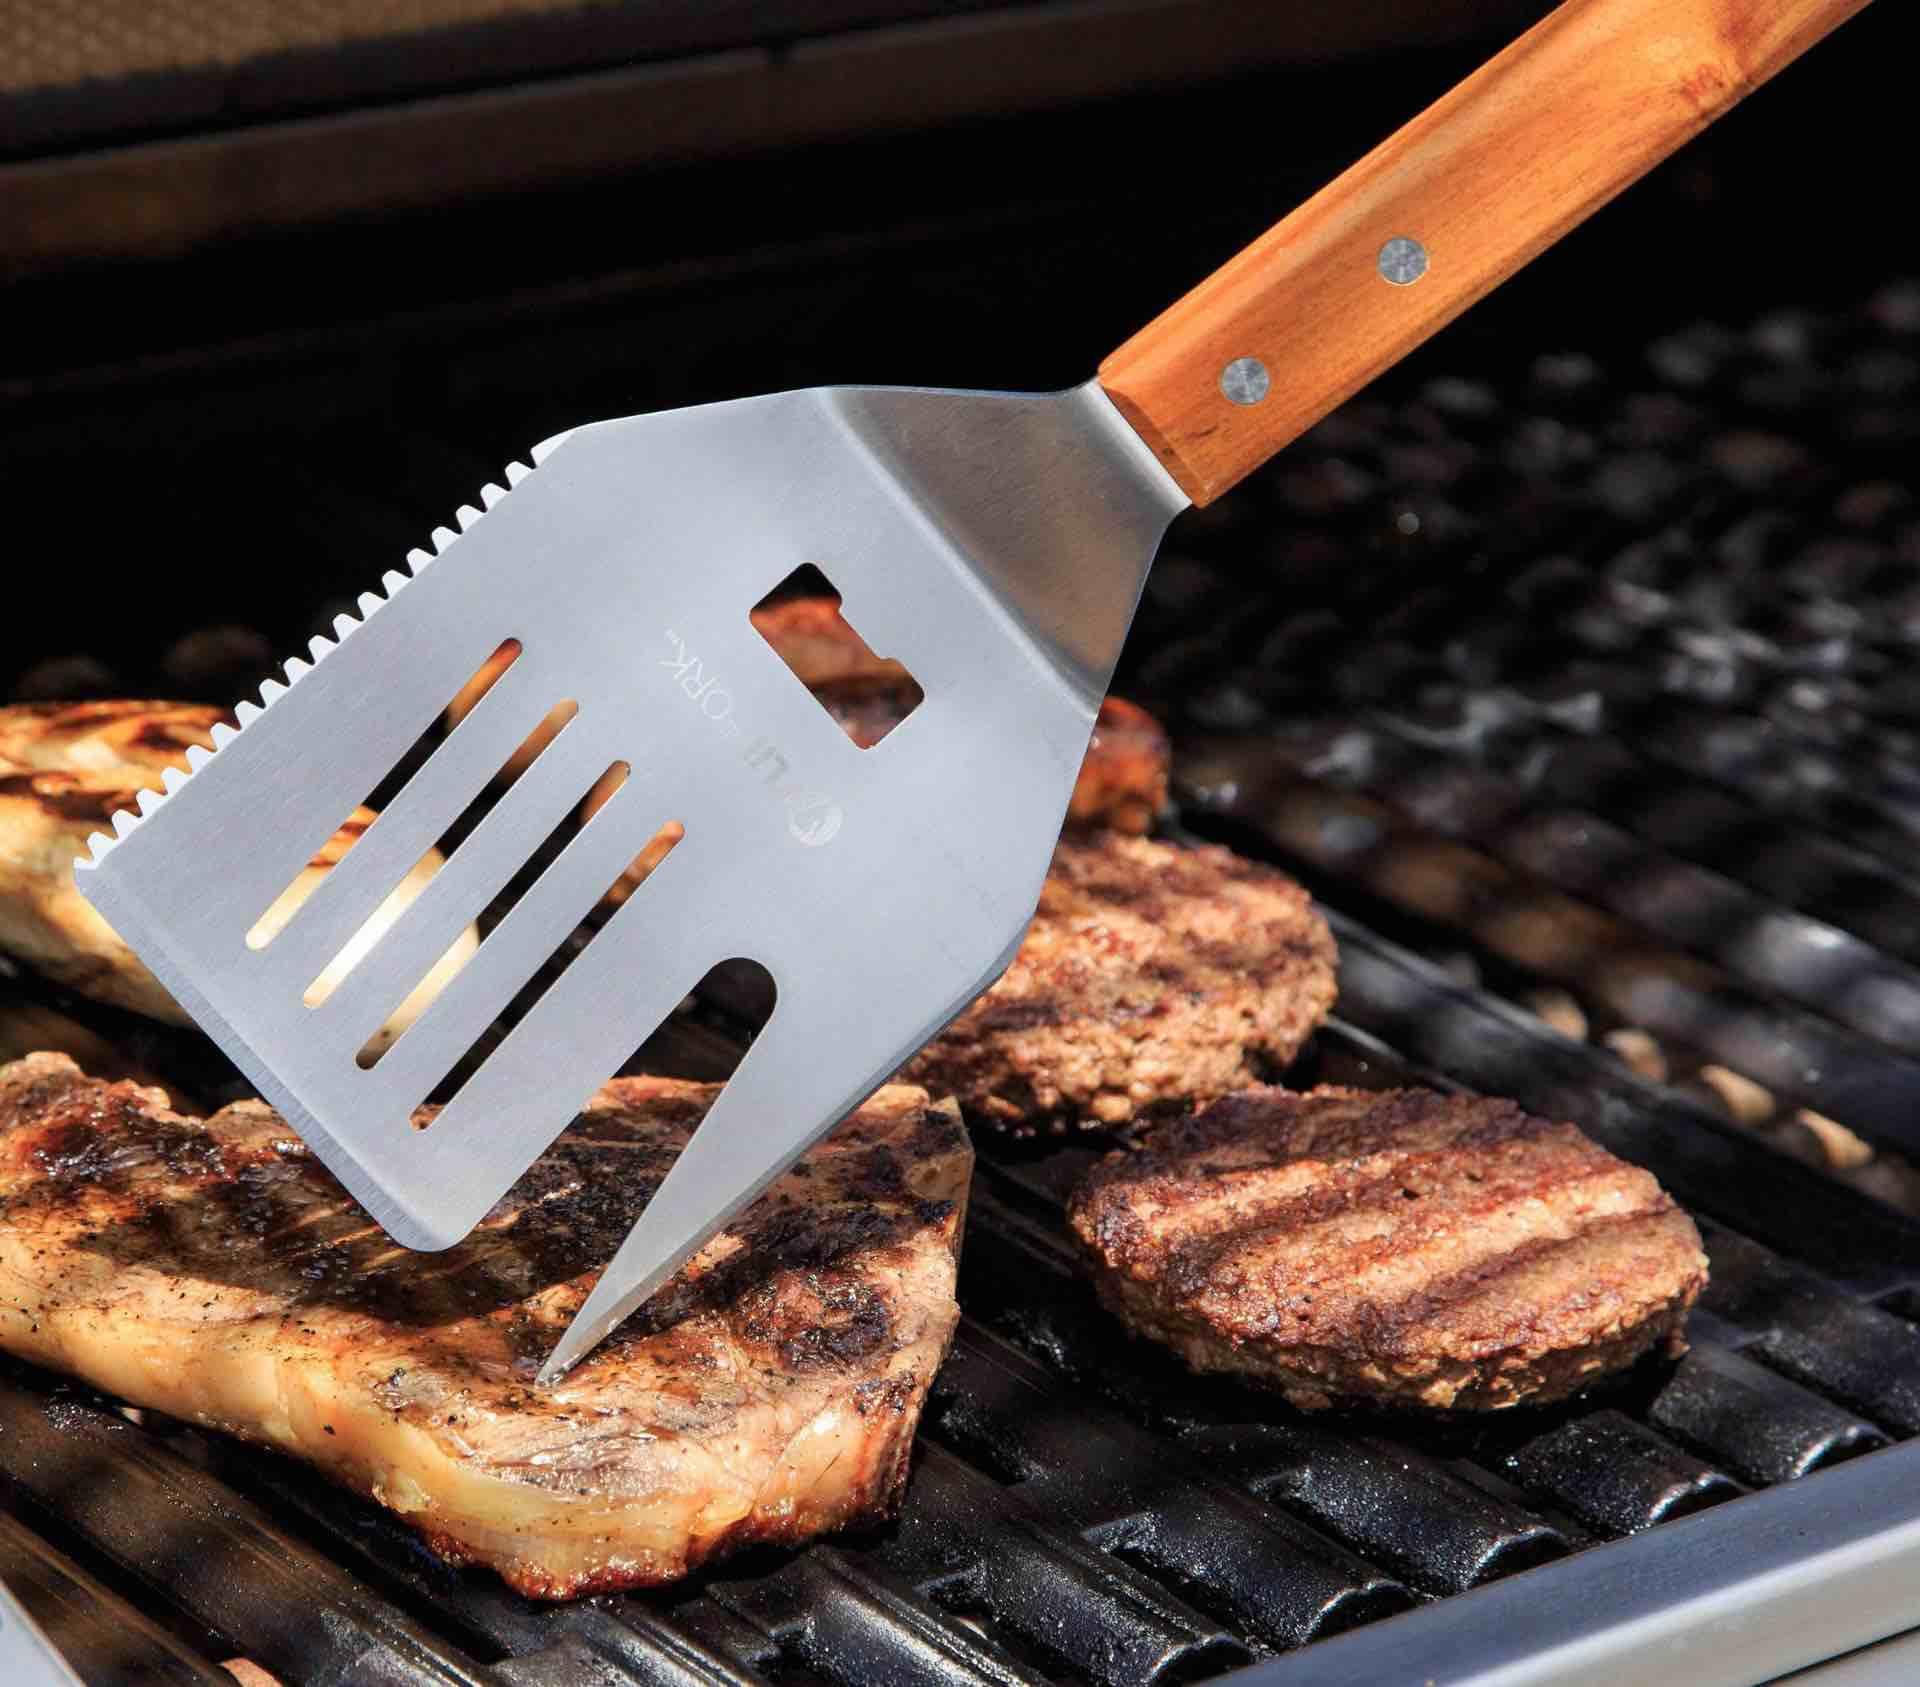 flipfork-boss-5-in-1-grill-spatula